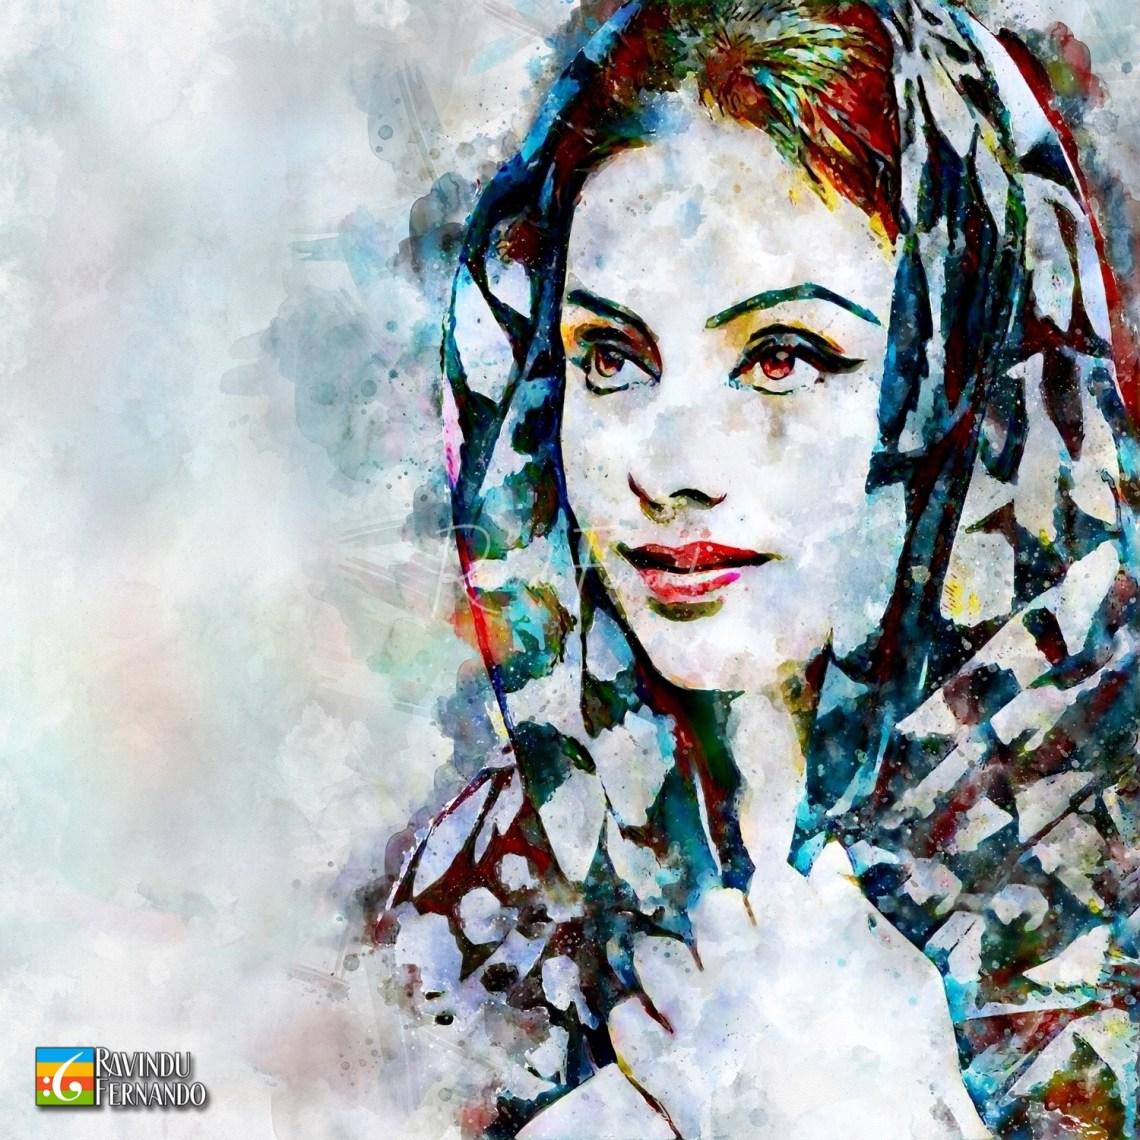 Yashoda Wimaladharma - Digital Watercolor Painting